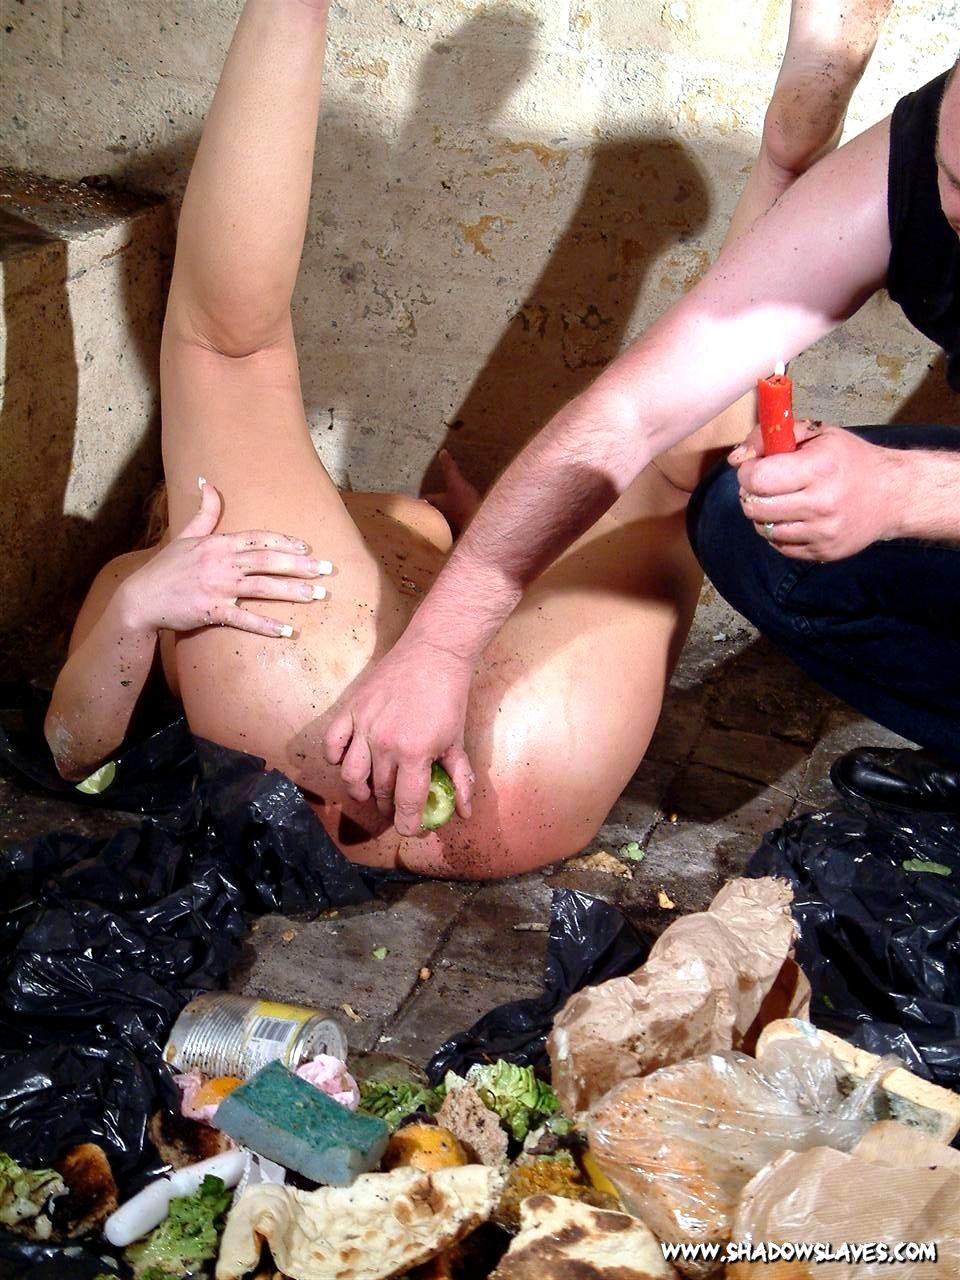 having-sex-in-garbage-porn-pics-u-suck-my-dick